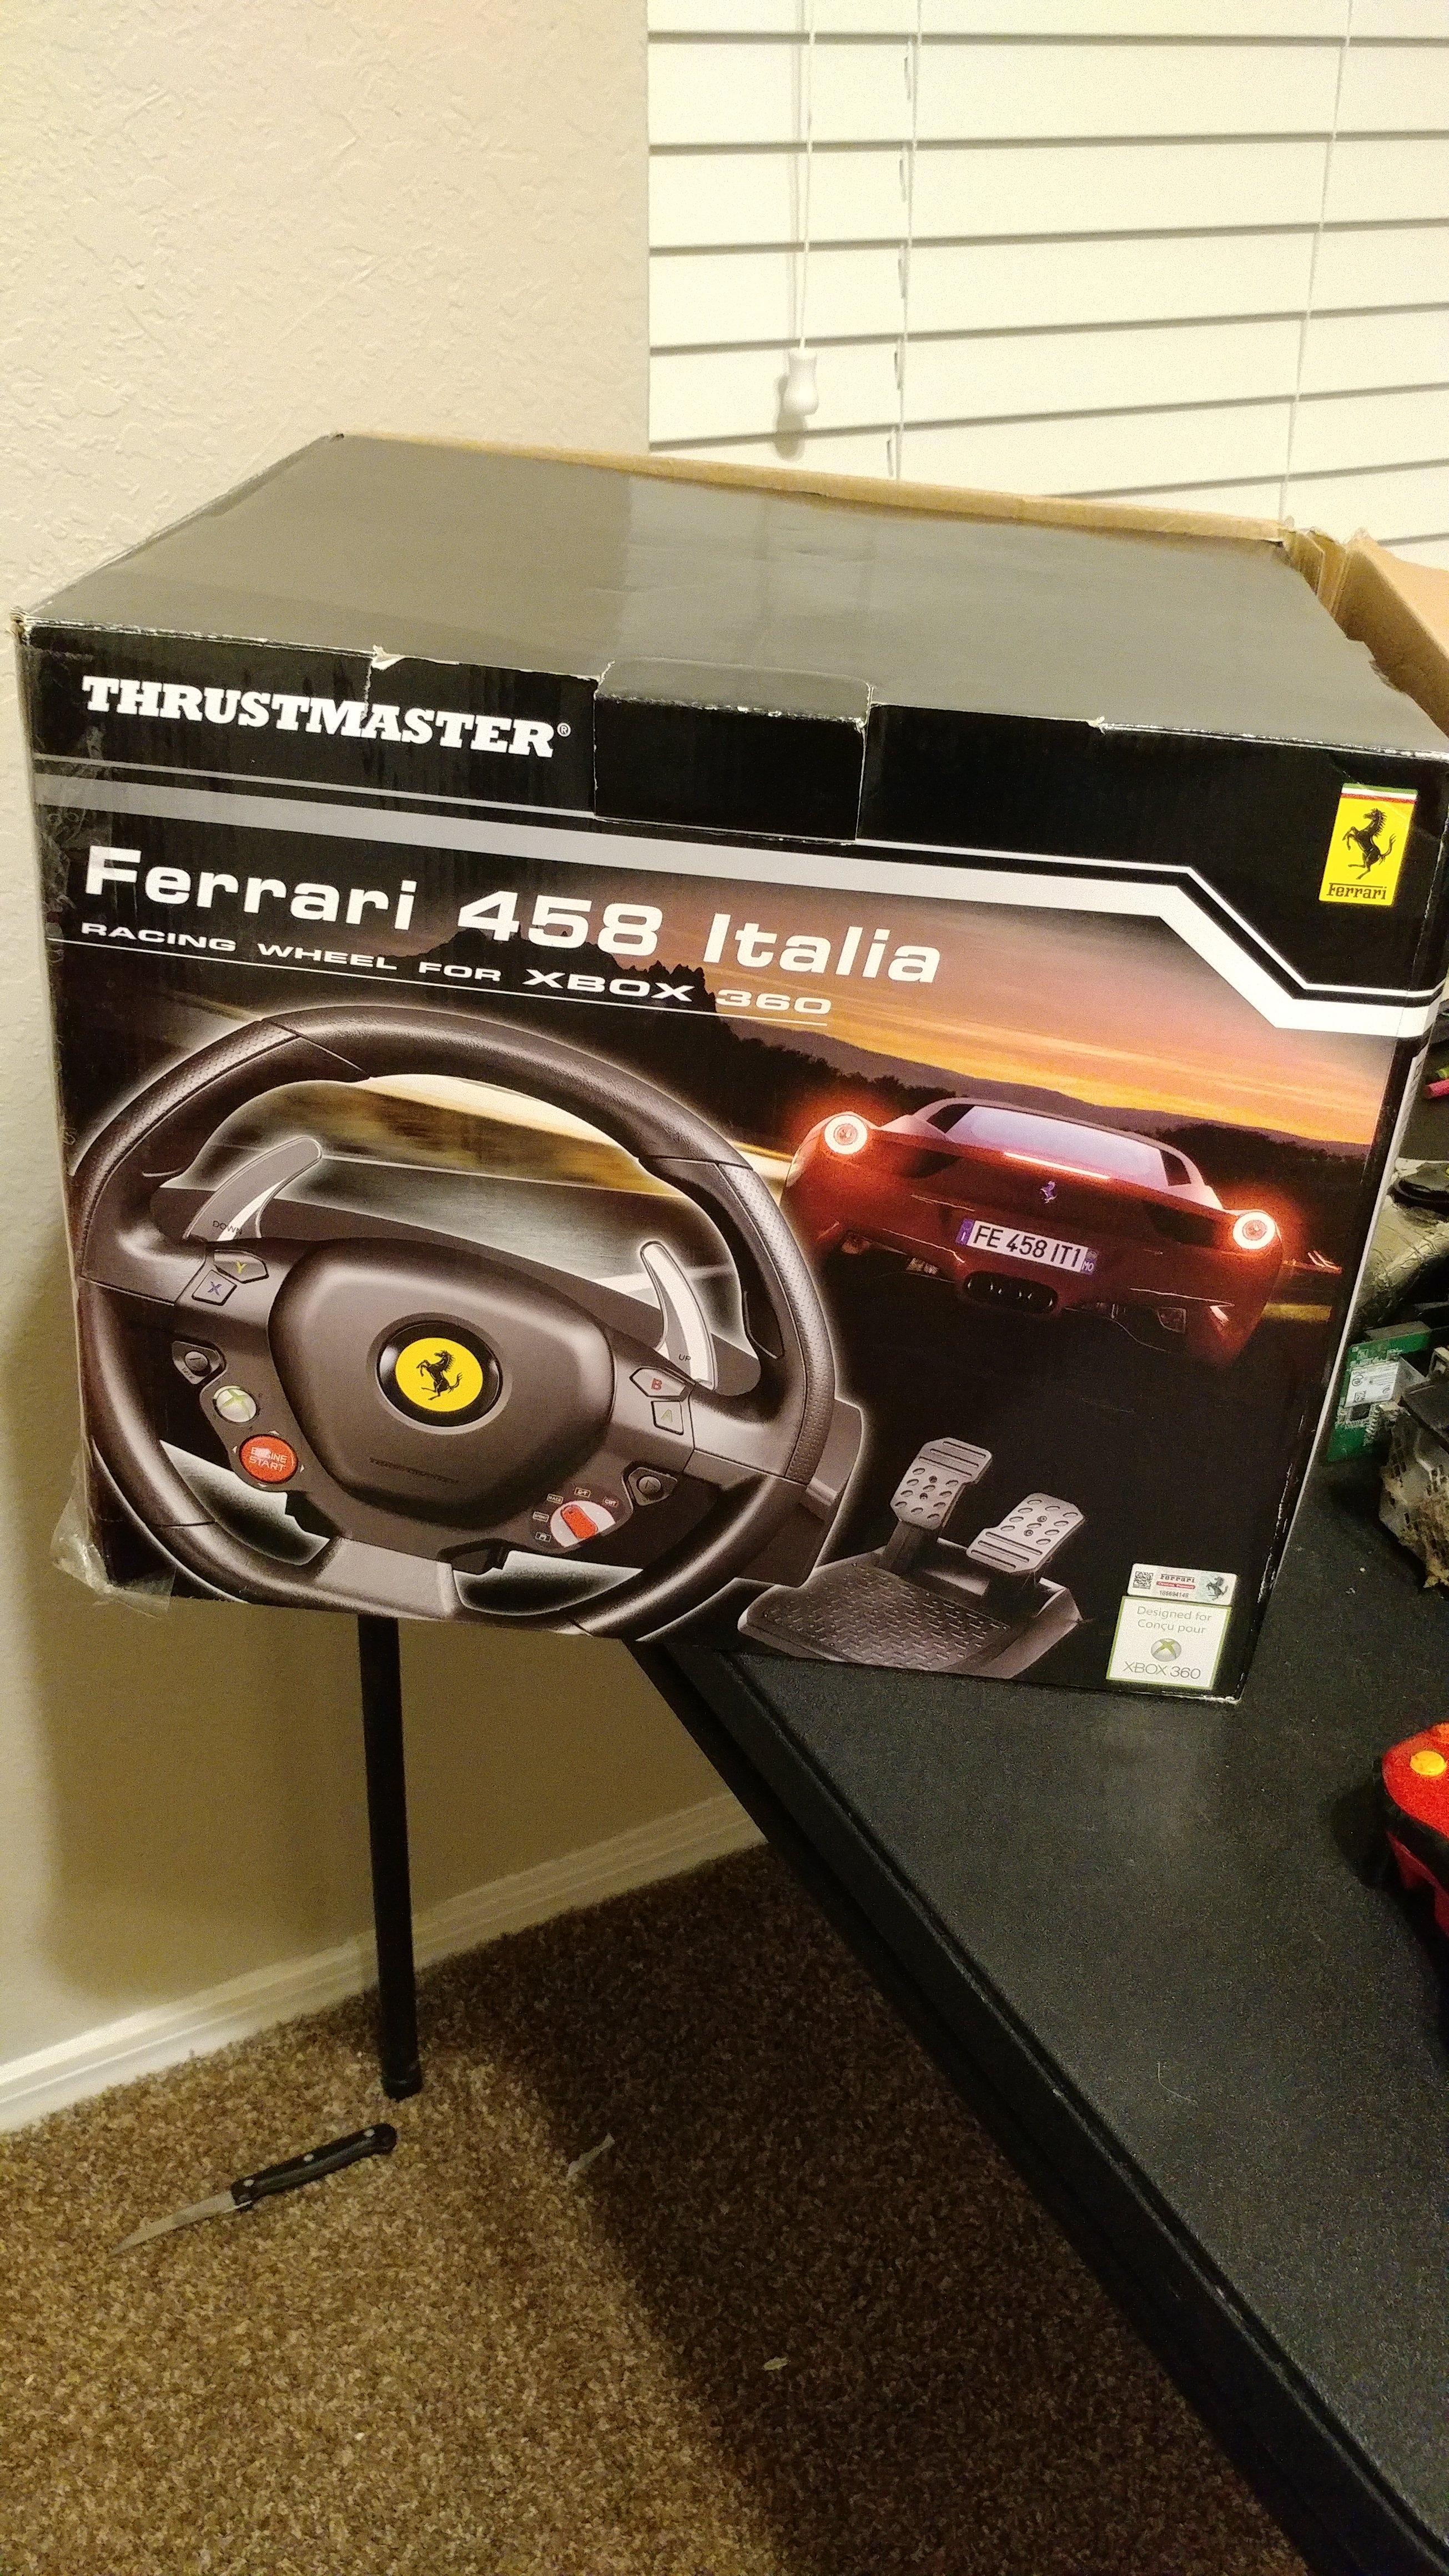 Xbox 360 And Xbox One Compatibility Thrustmaster Ferrari 458 Italia Xbox 360 Xbox Discussion Insidesimracing Forums